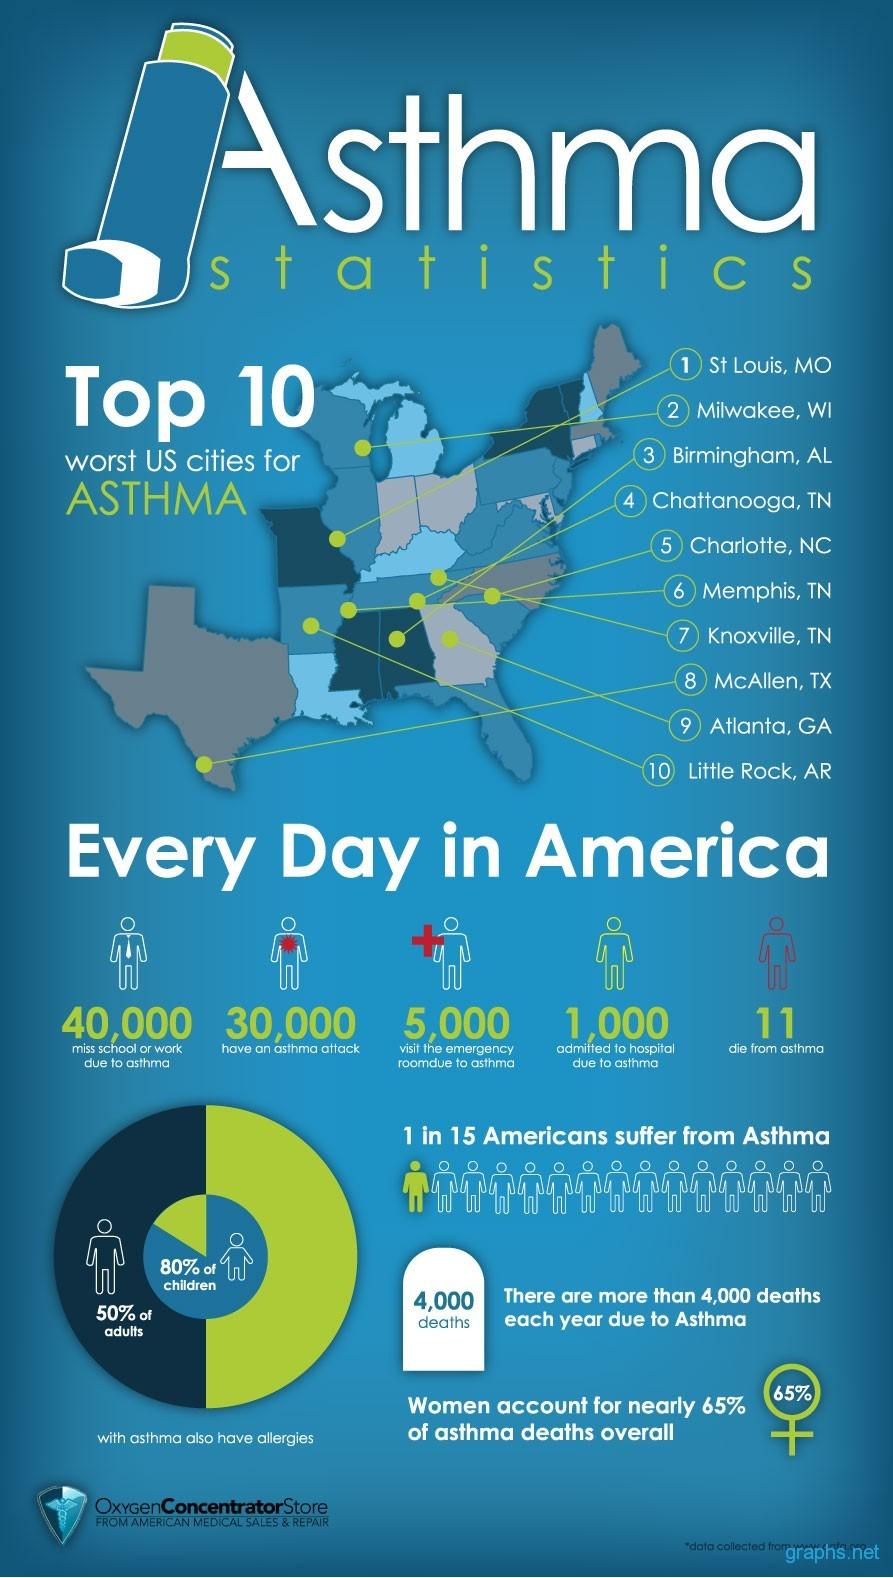 Statistics of Asthma